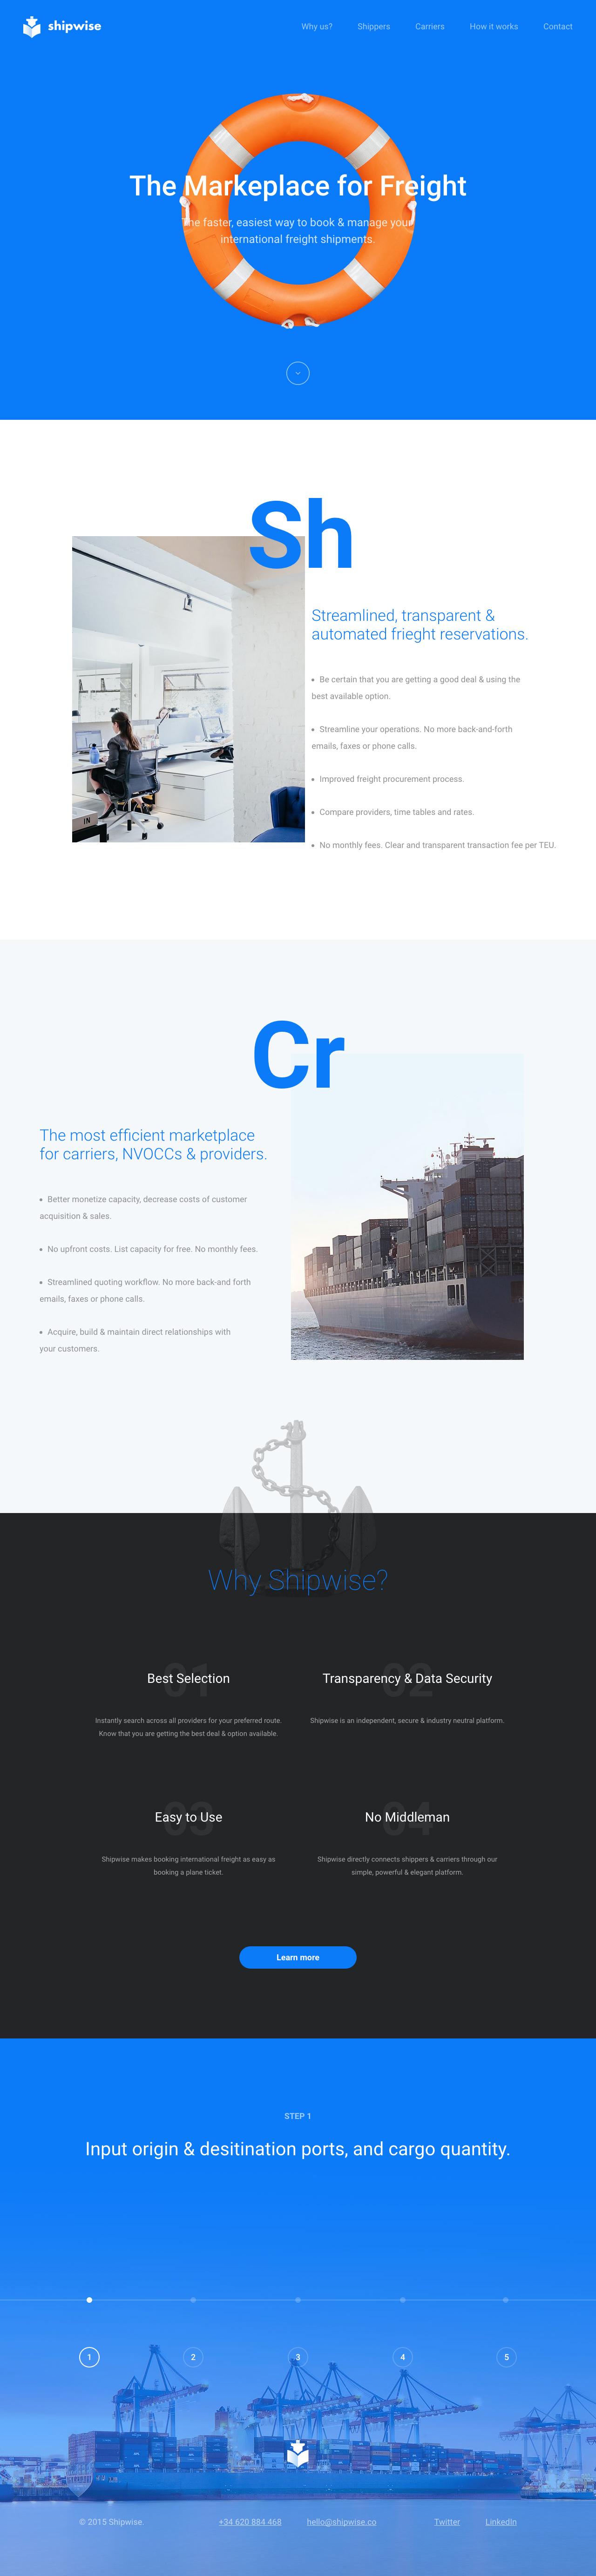 Shipwise Website Screenshot